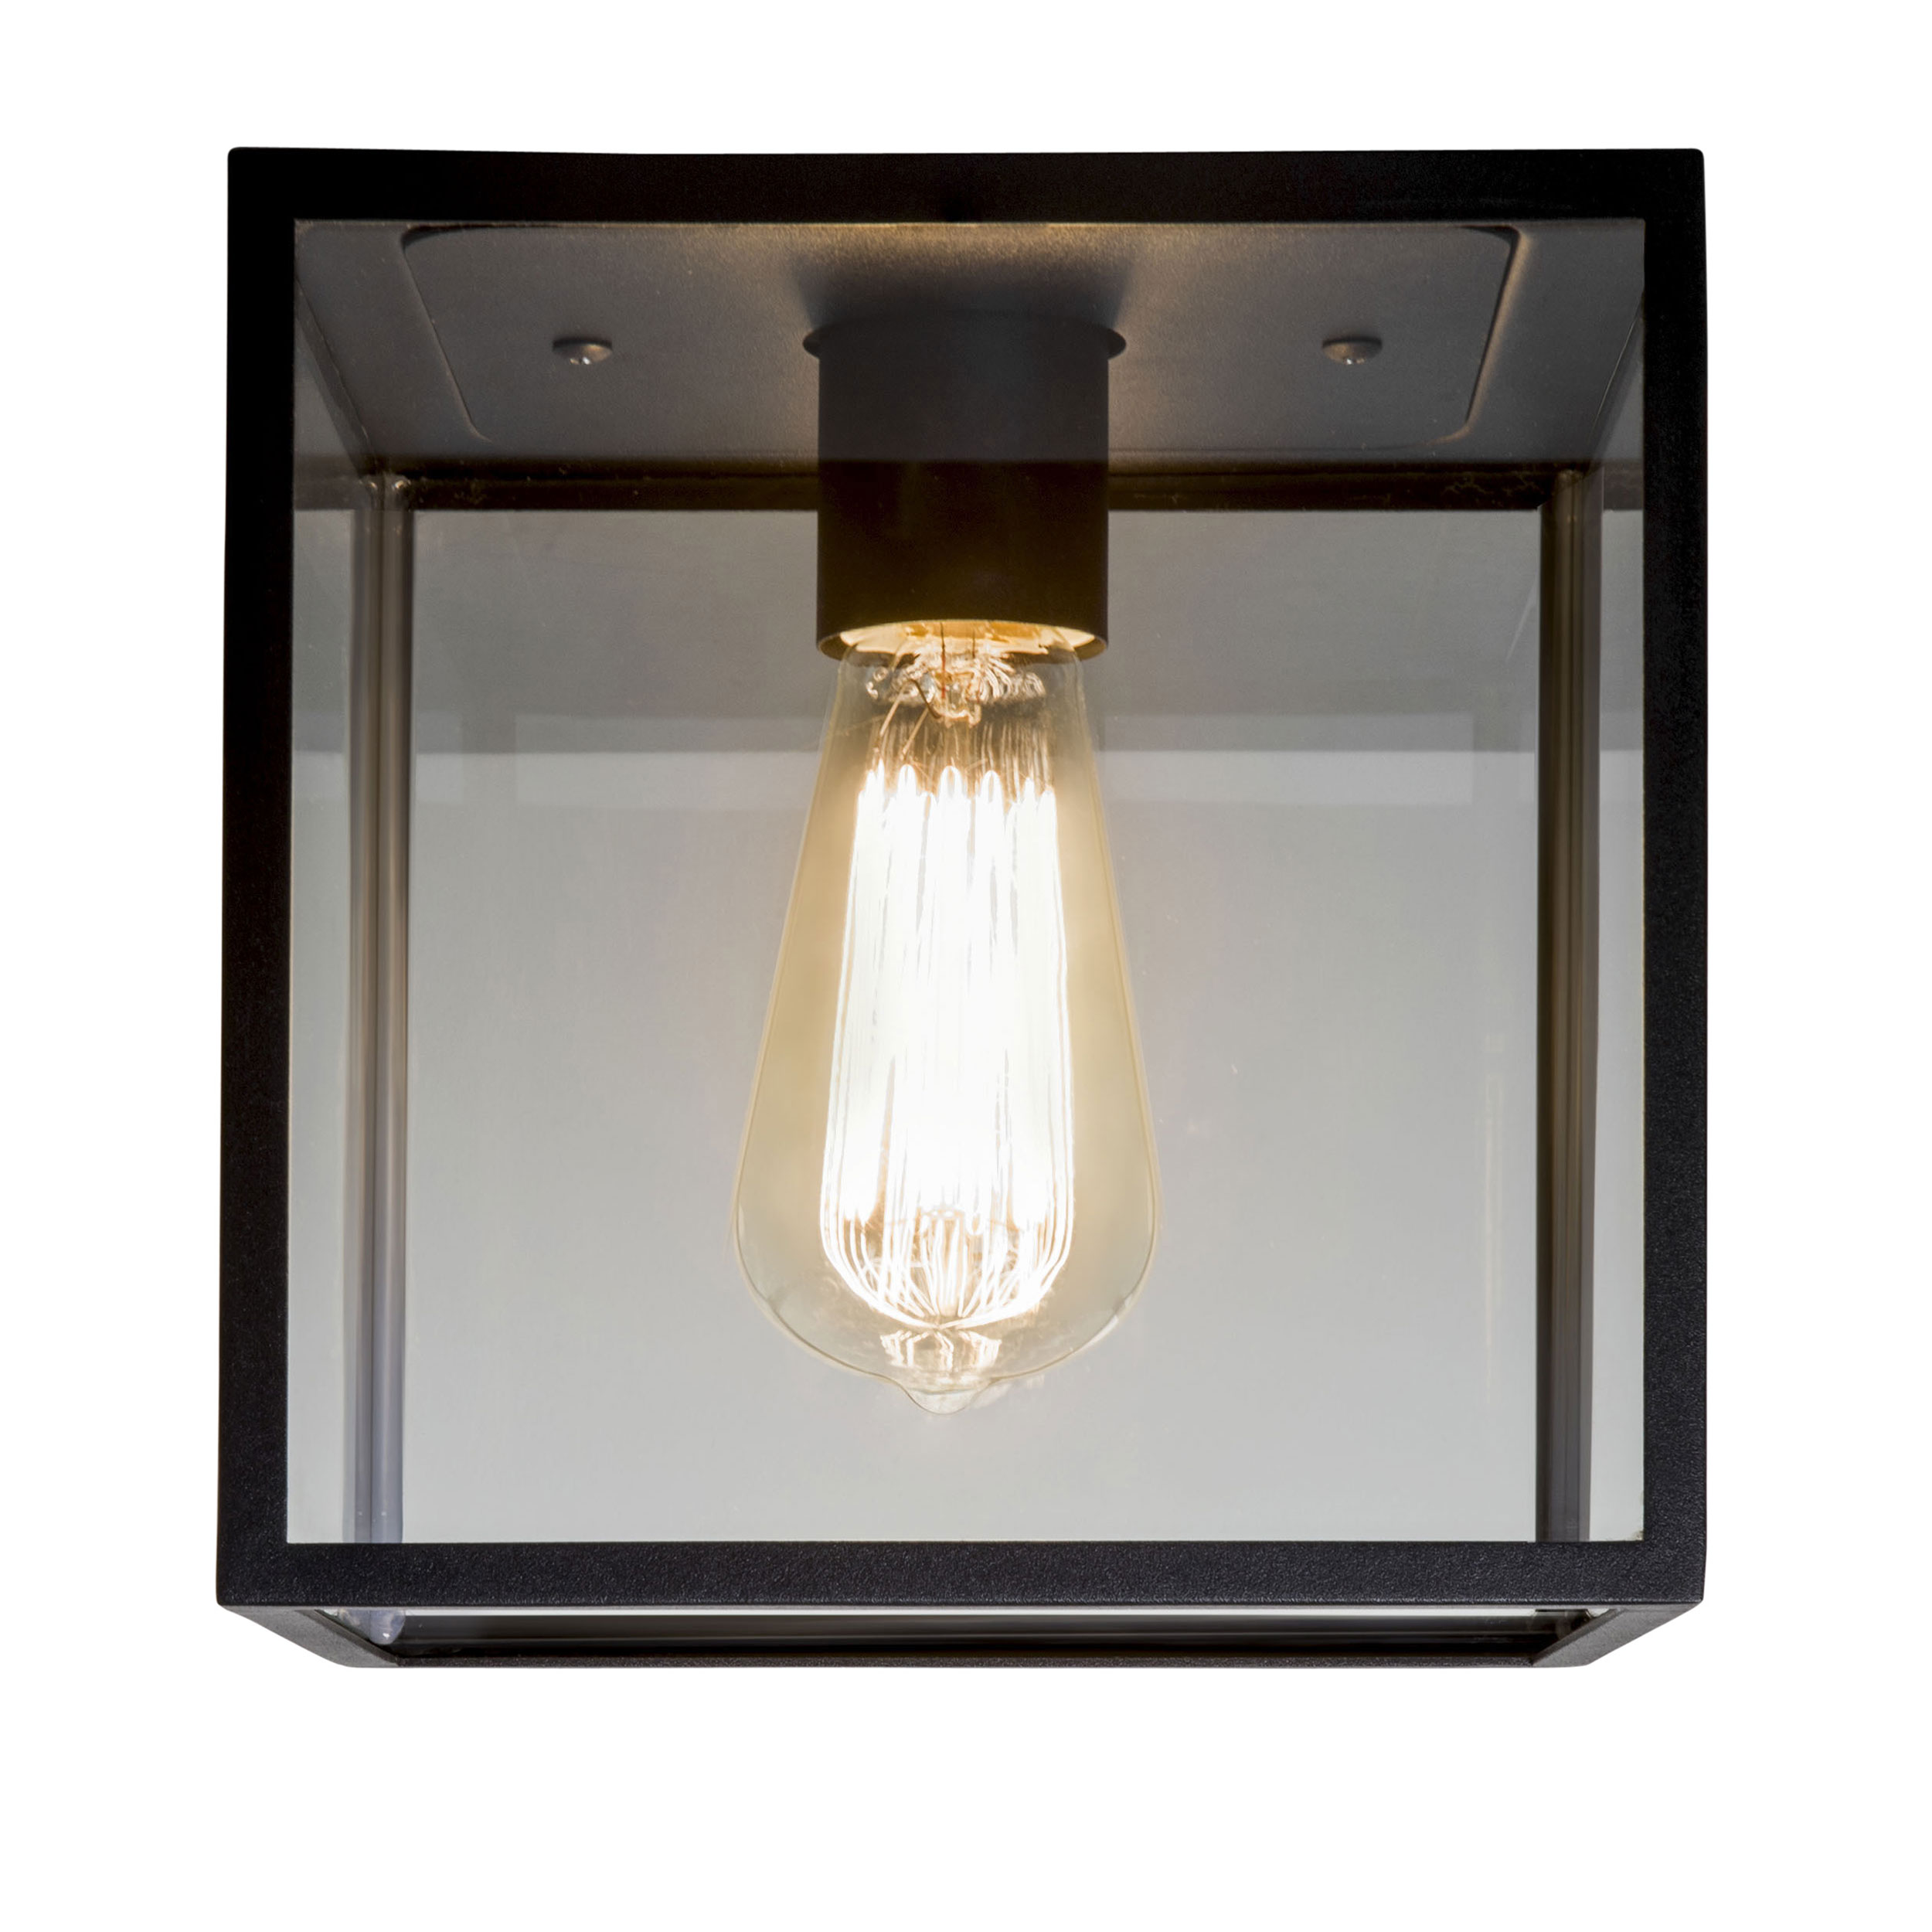 Light Dimmer Wiring Diagram Http Wwwdoityourselfcom Forum Lighting